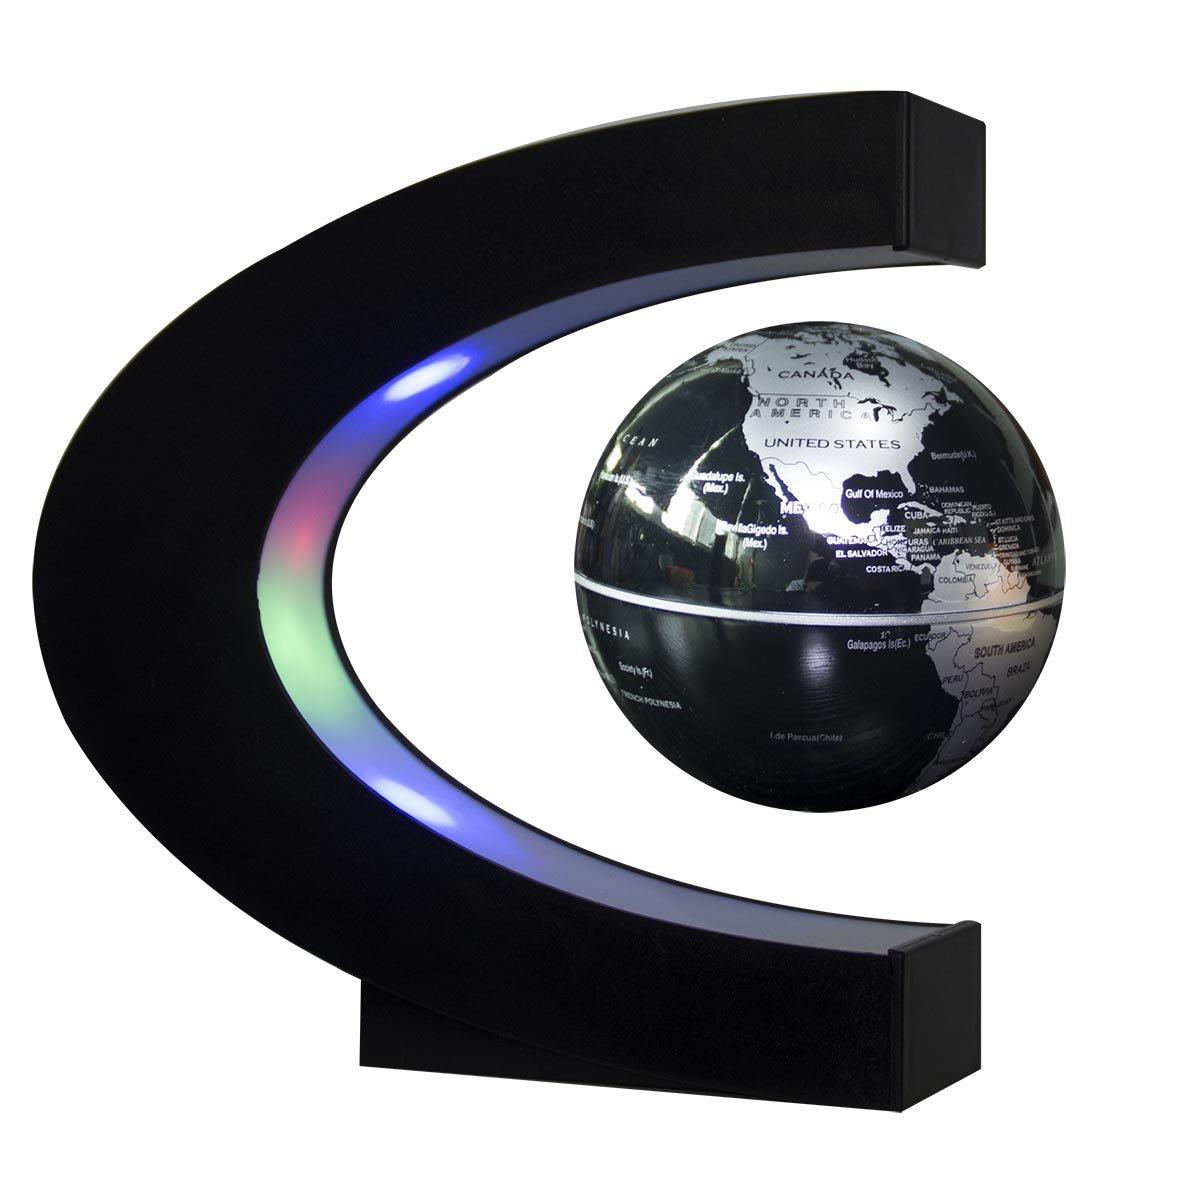 Senders Floating Globe with LED Lights C Shape Magnetic Levitation Floating Globe World Map for Desk Decoration (Black-Silver) by Senders